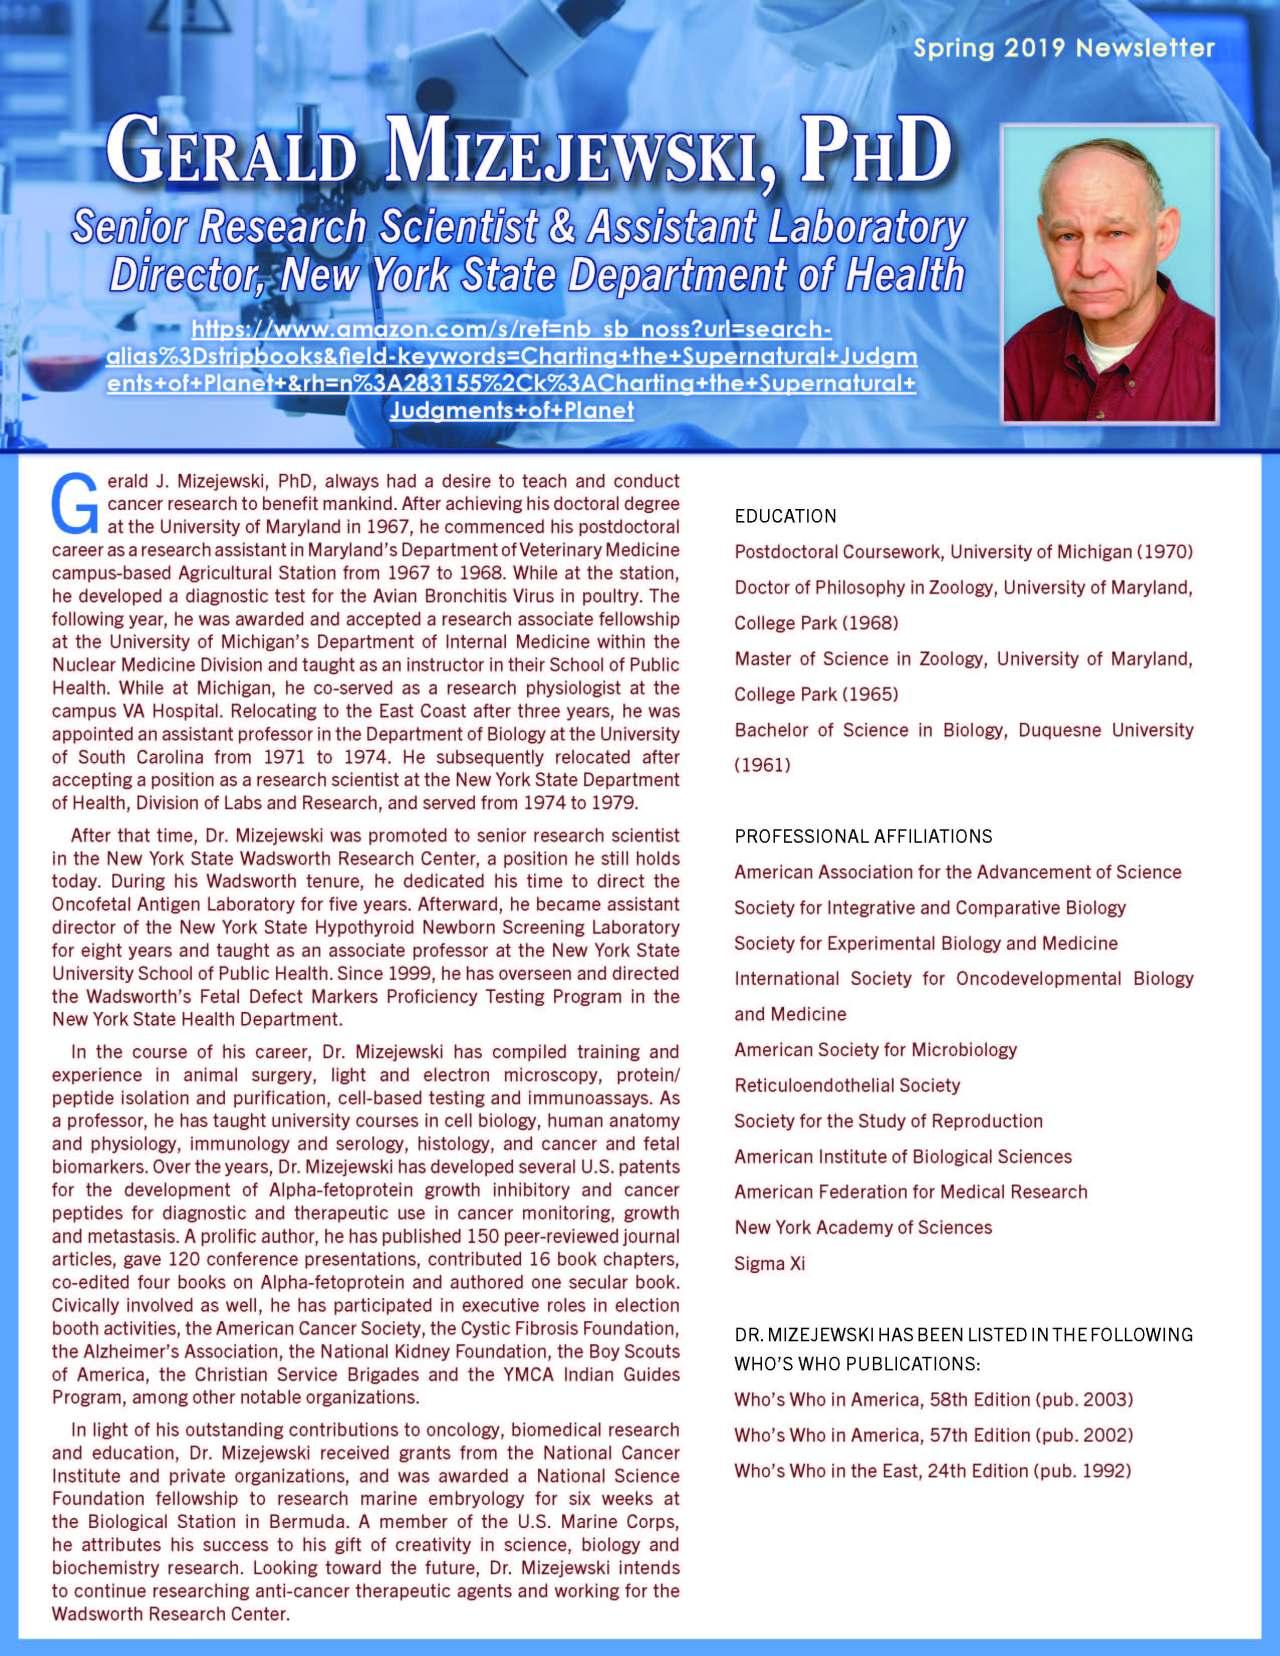 Mizejewski, Gerald 2143611_21083472 Newsletter REVISED.jpg